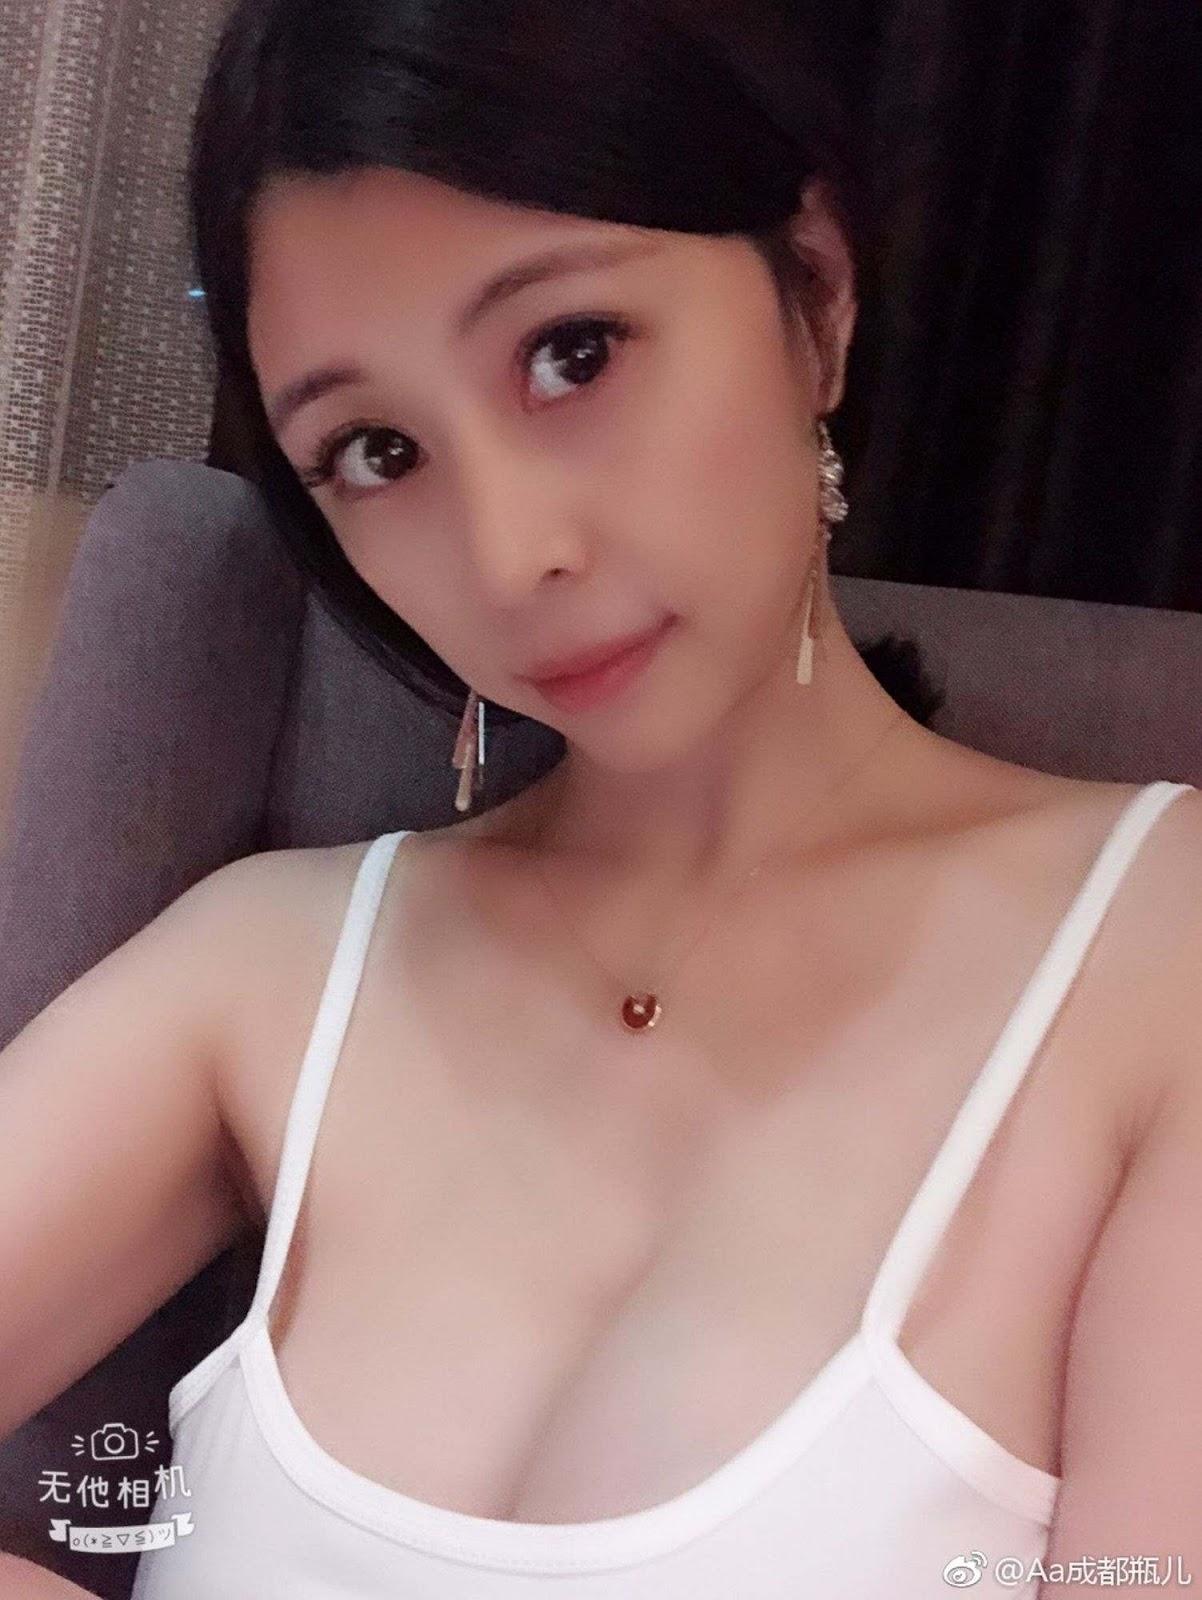 aHR0cHM6Ly93d3cubXlteXBpYy5uZXQvZGF0YS9hdHRhY2htZW50L2ZvcnVtLzIwMTkwOC8yMC8wODM0MDZjcndlNWUyazllY3lmcmZ5LmpwZy50aHVtYi5qcGc%253D - 成都瓶儿 - Chengdu Pinger big tits selfie nude 2020